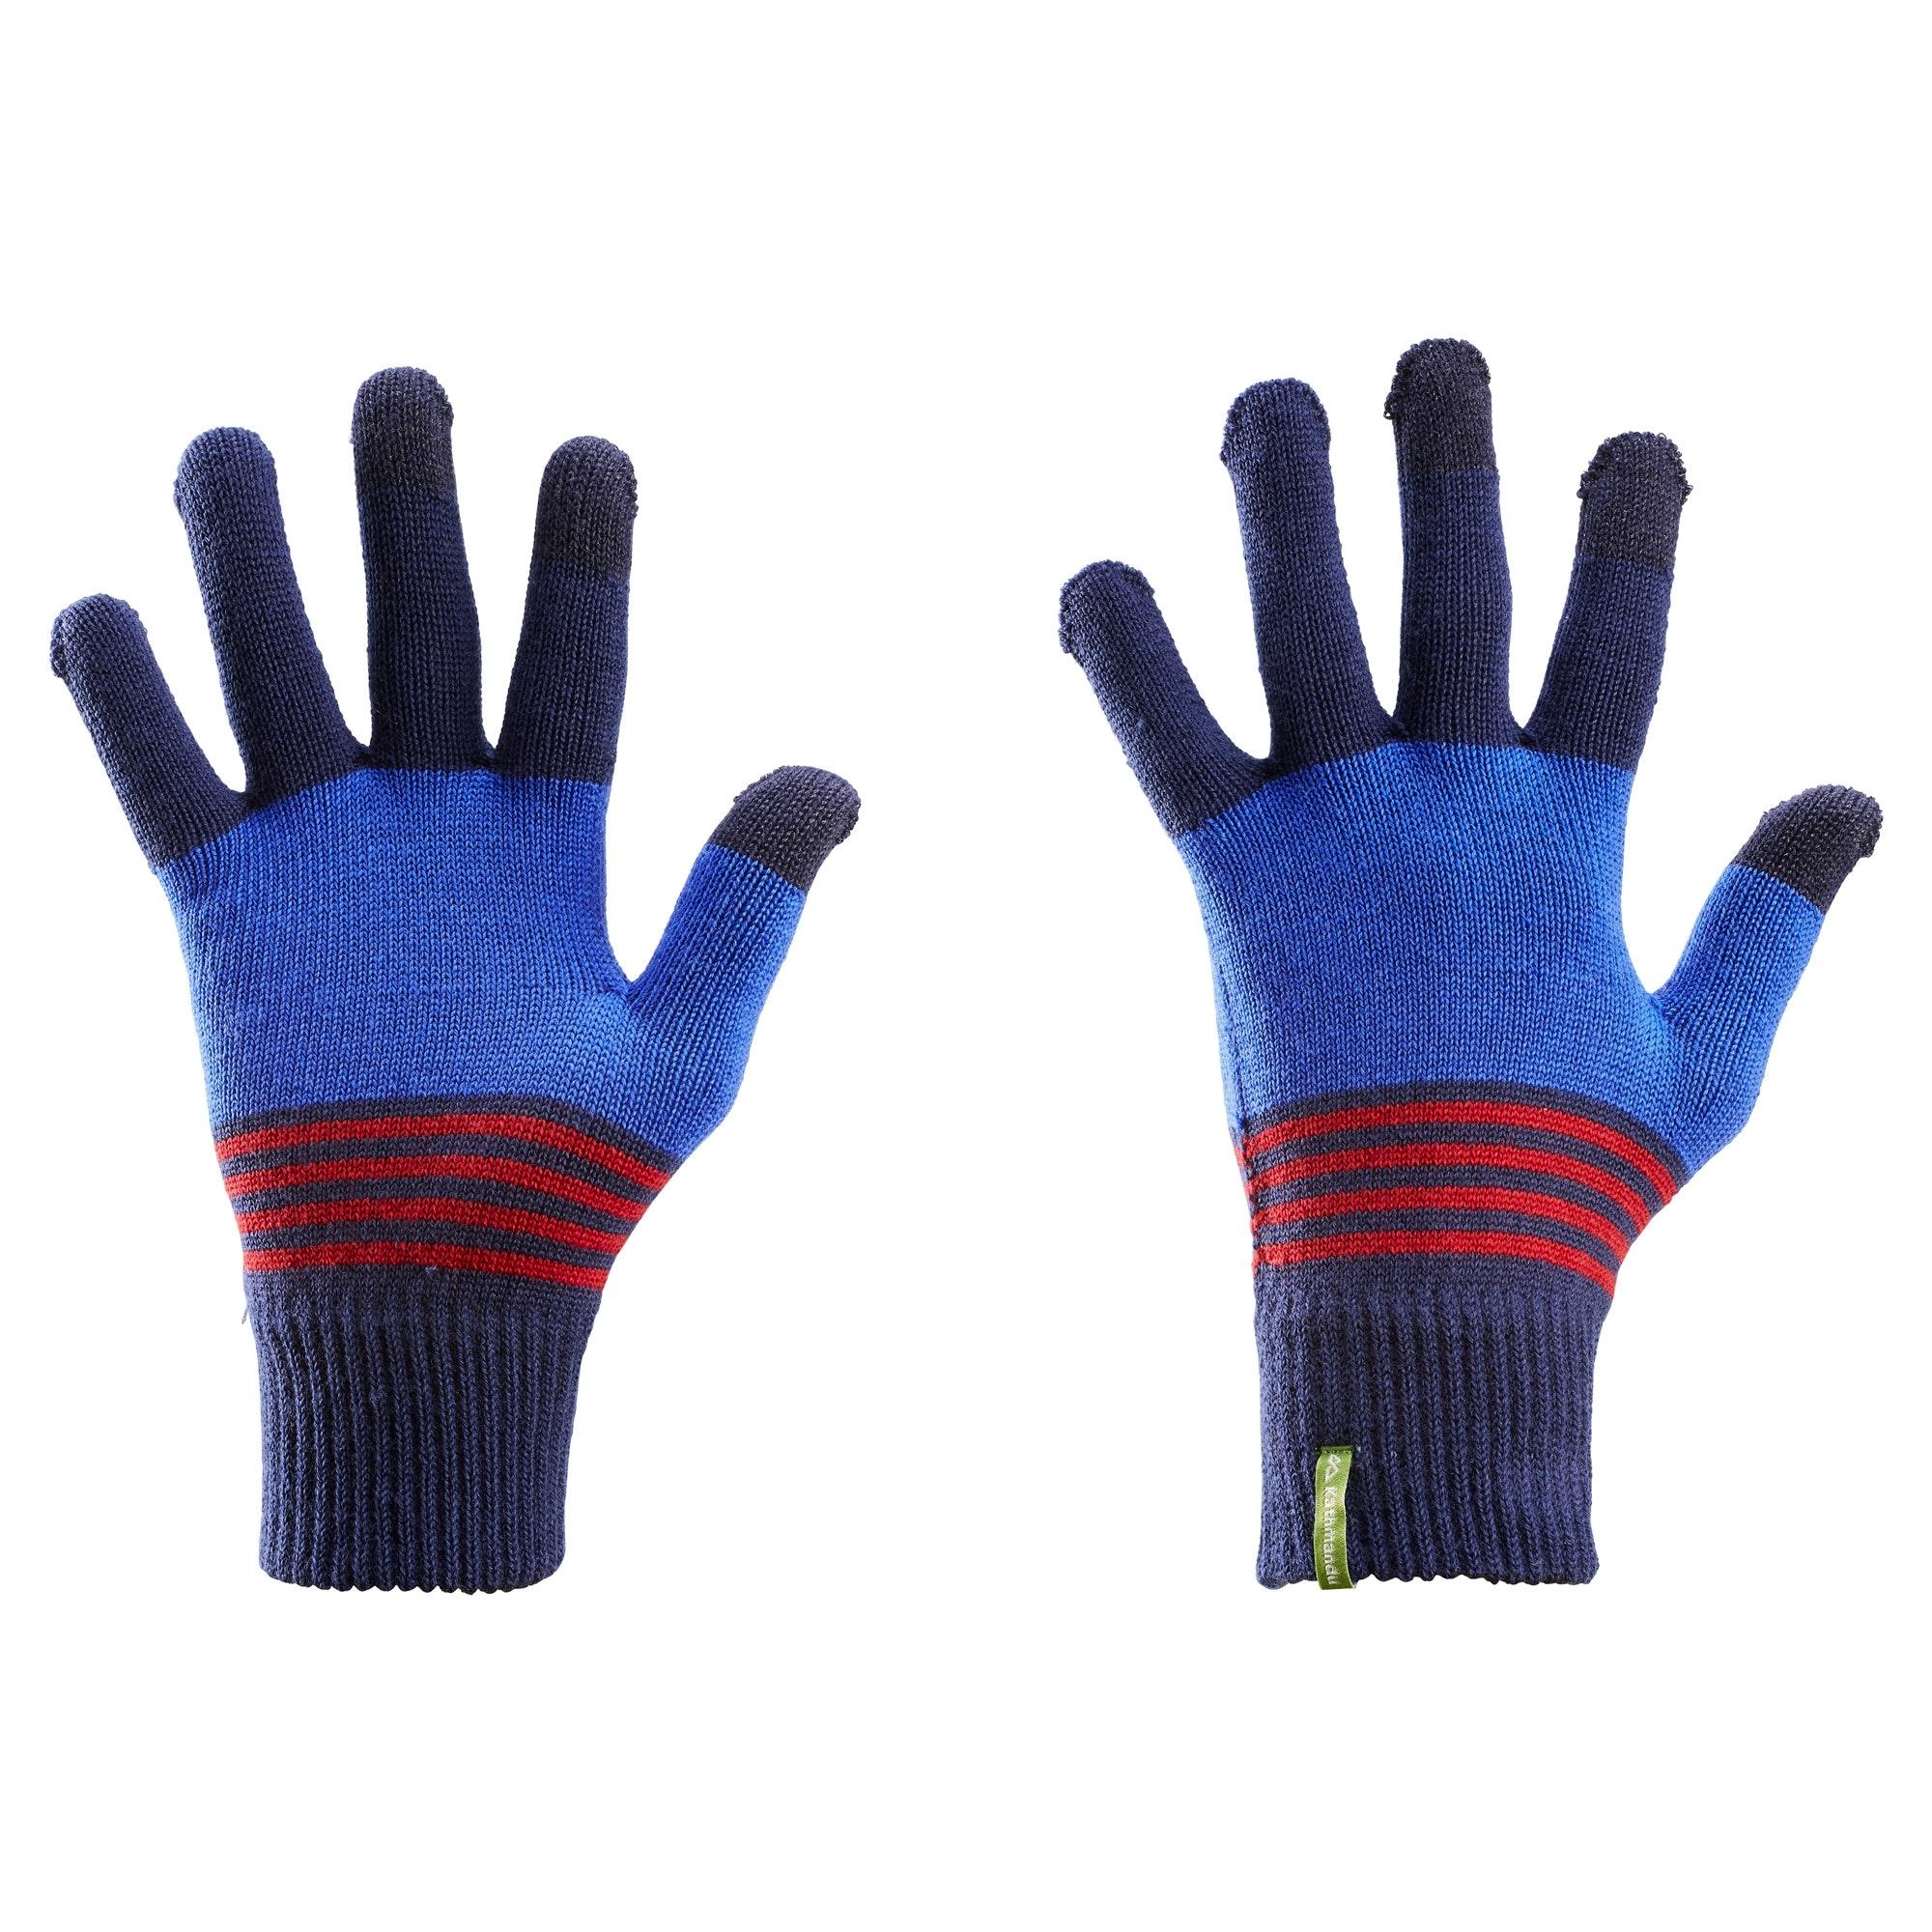 266c6da0977 Kathmandu Men s Women s Close Fitting Warm Winter Merino Wool Gloves ...